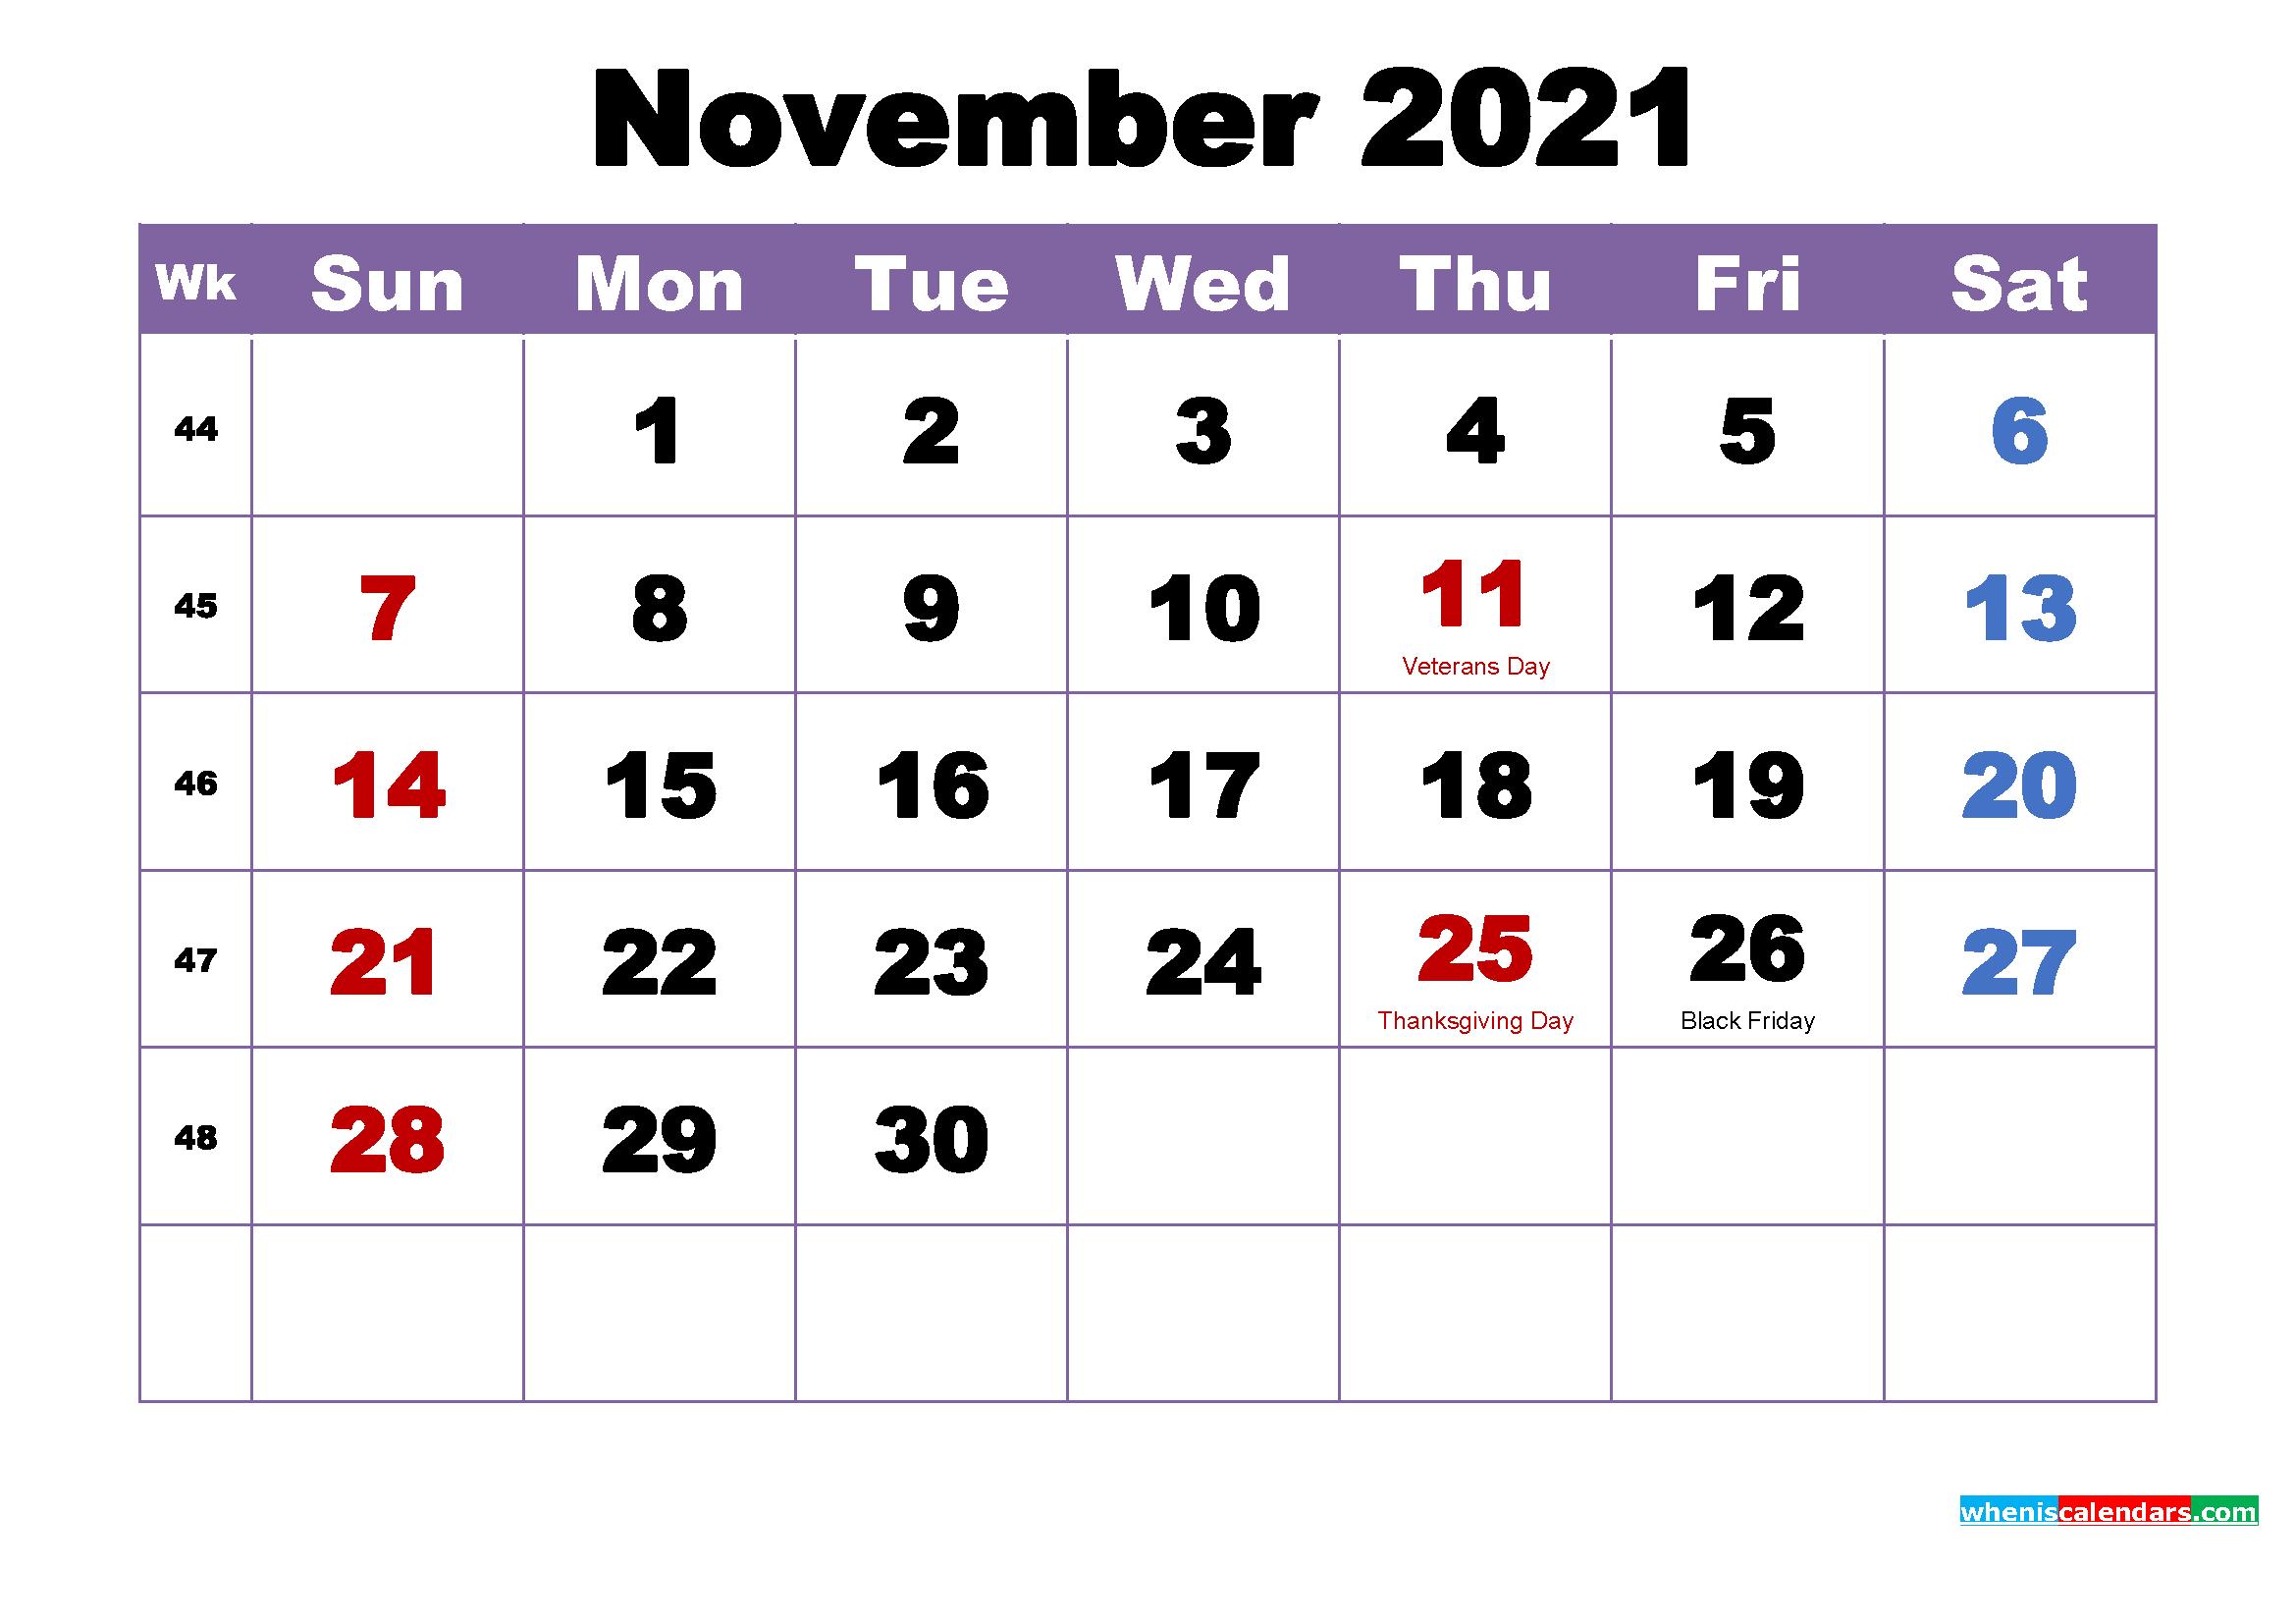 November 2021 Calendar With Holidays Printable   2022 Calendar November 2021 Calendar To Print